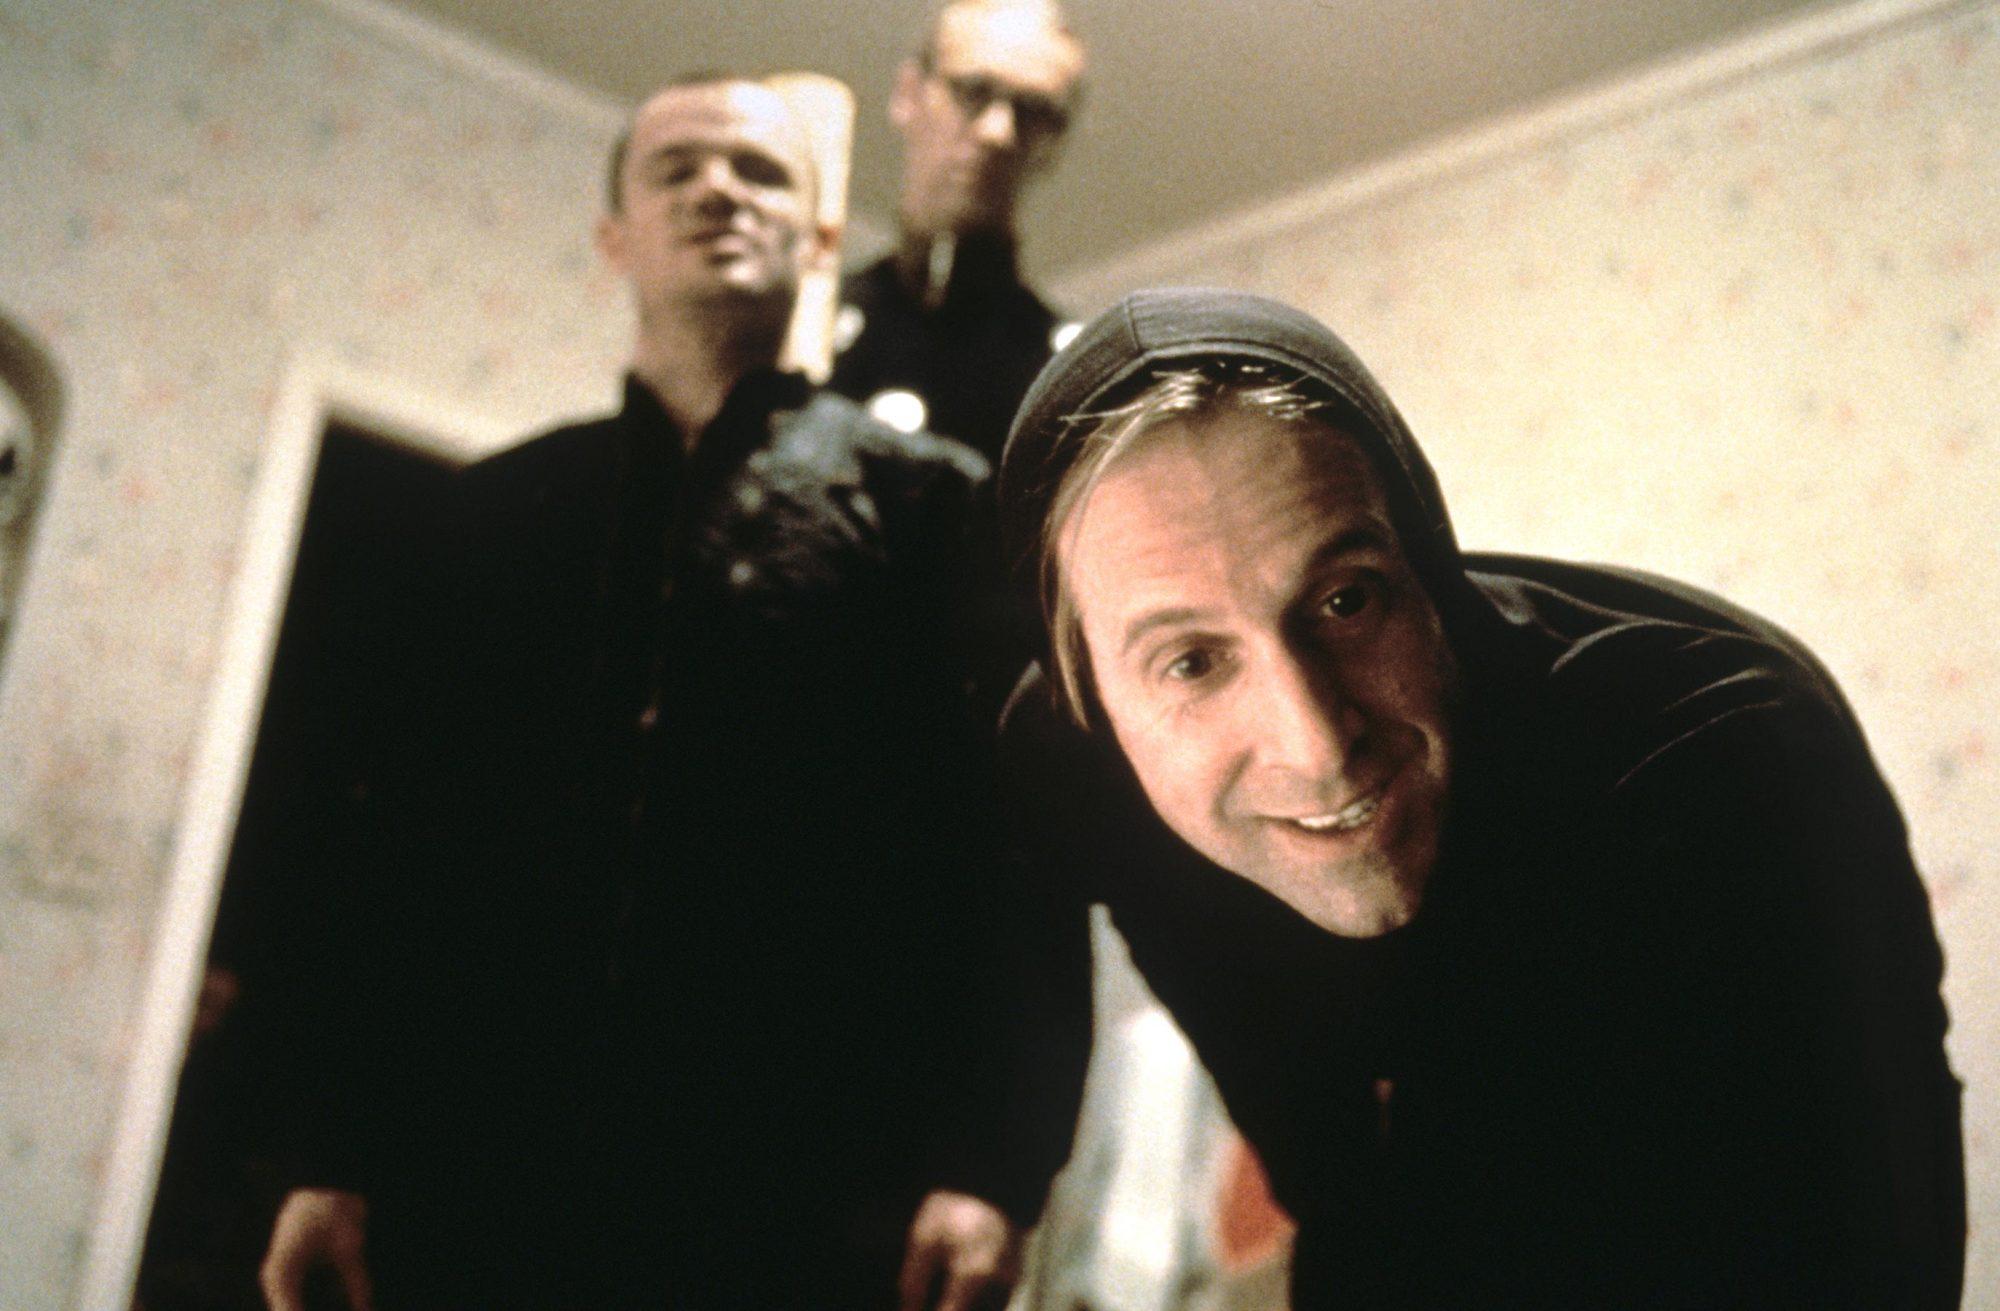 THE BIG LEBOWSKI, Peter Stormare (front), Flea, Torsten Voges (rear), 1998, © Gramercy Pictures/cour